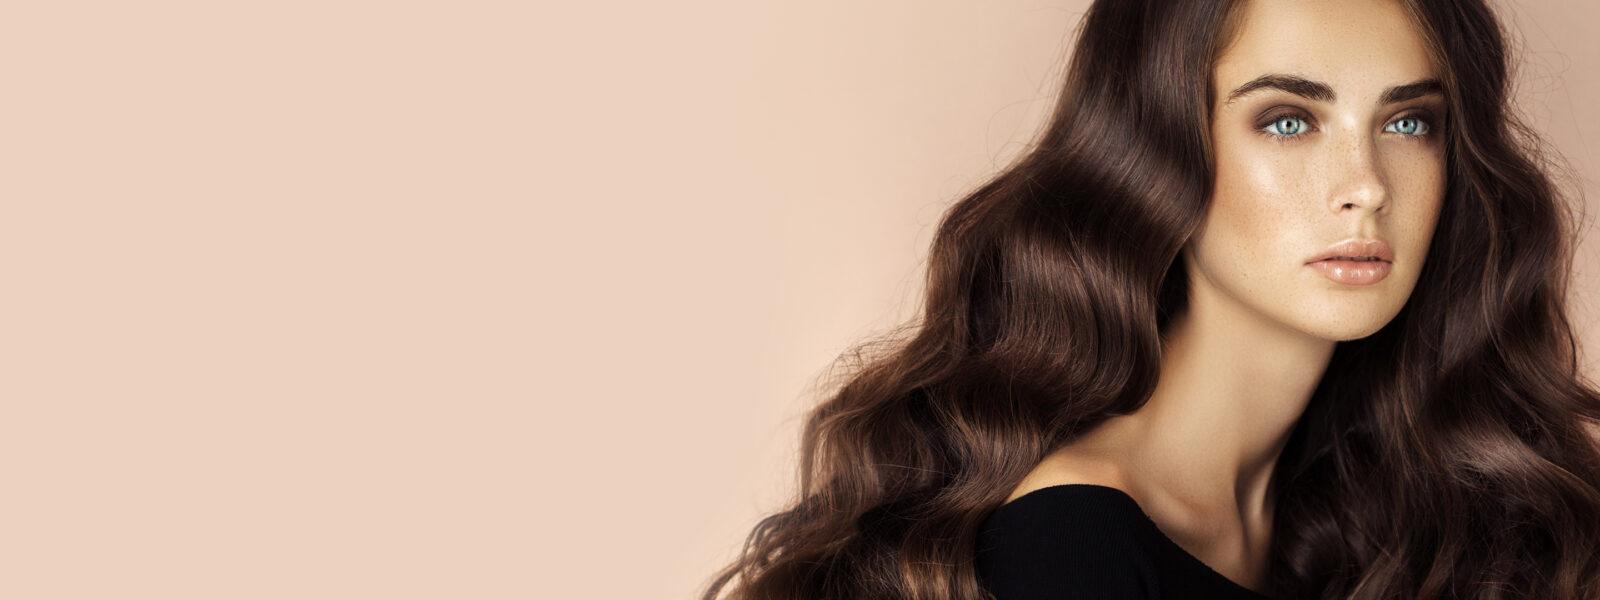 Salon Sima Announces Hair Texture & Treatment Services